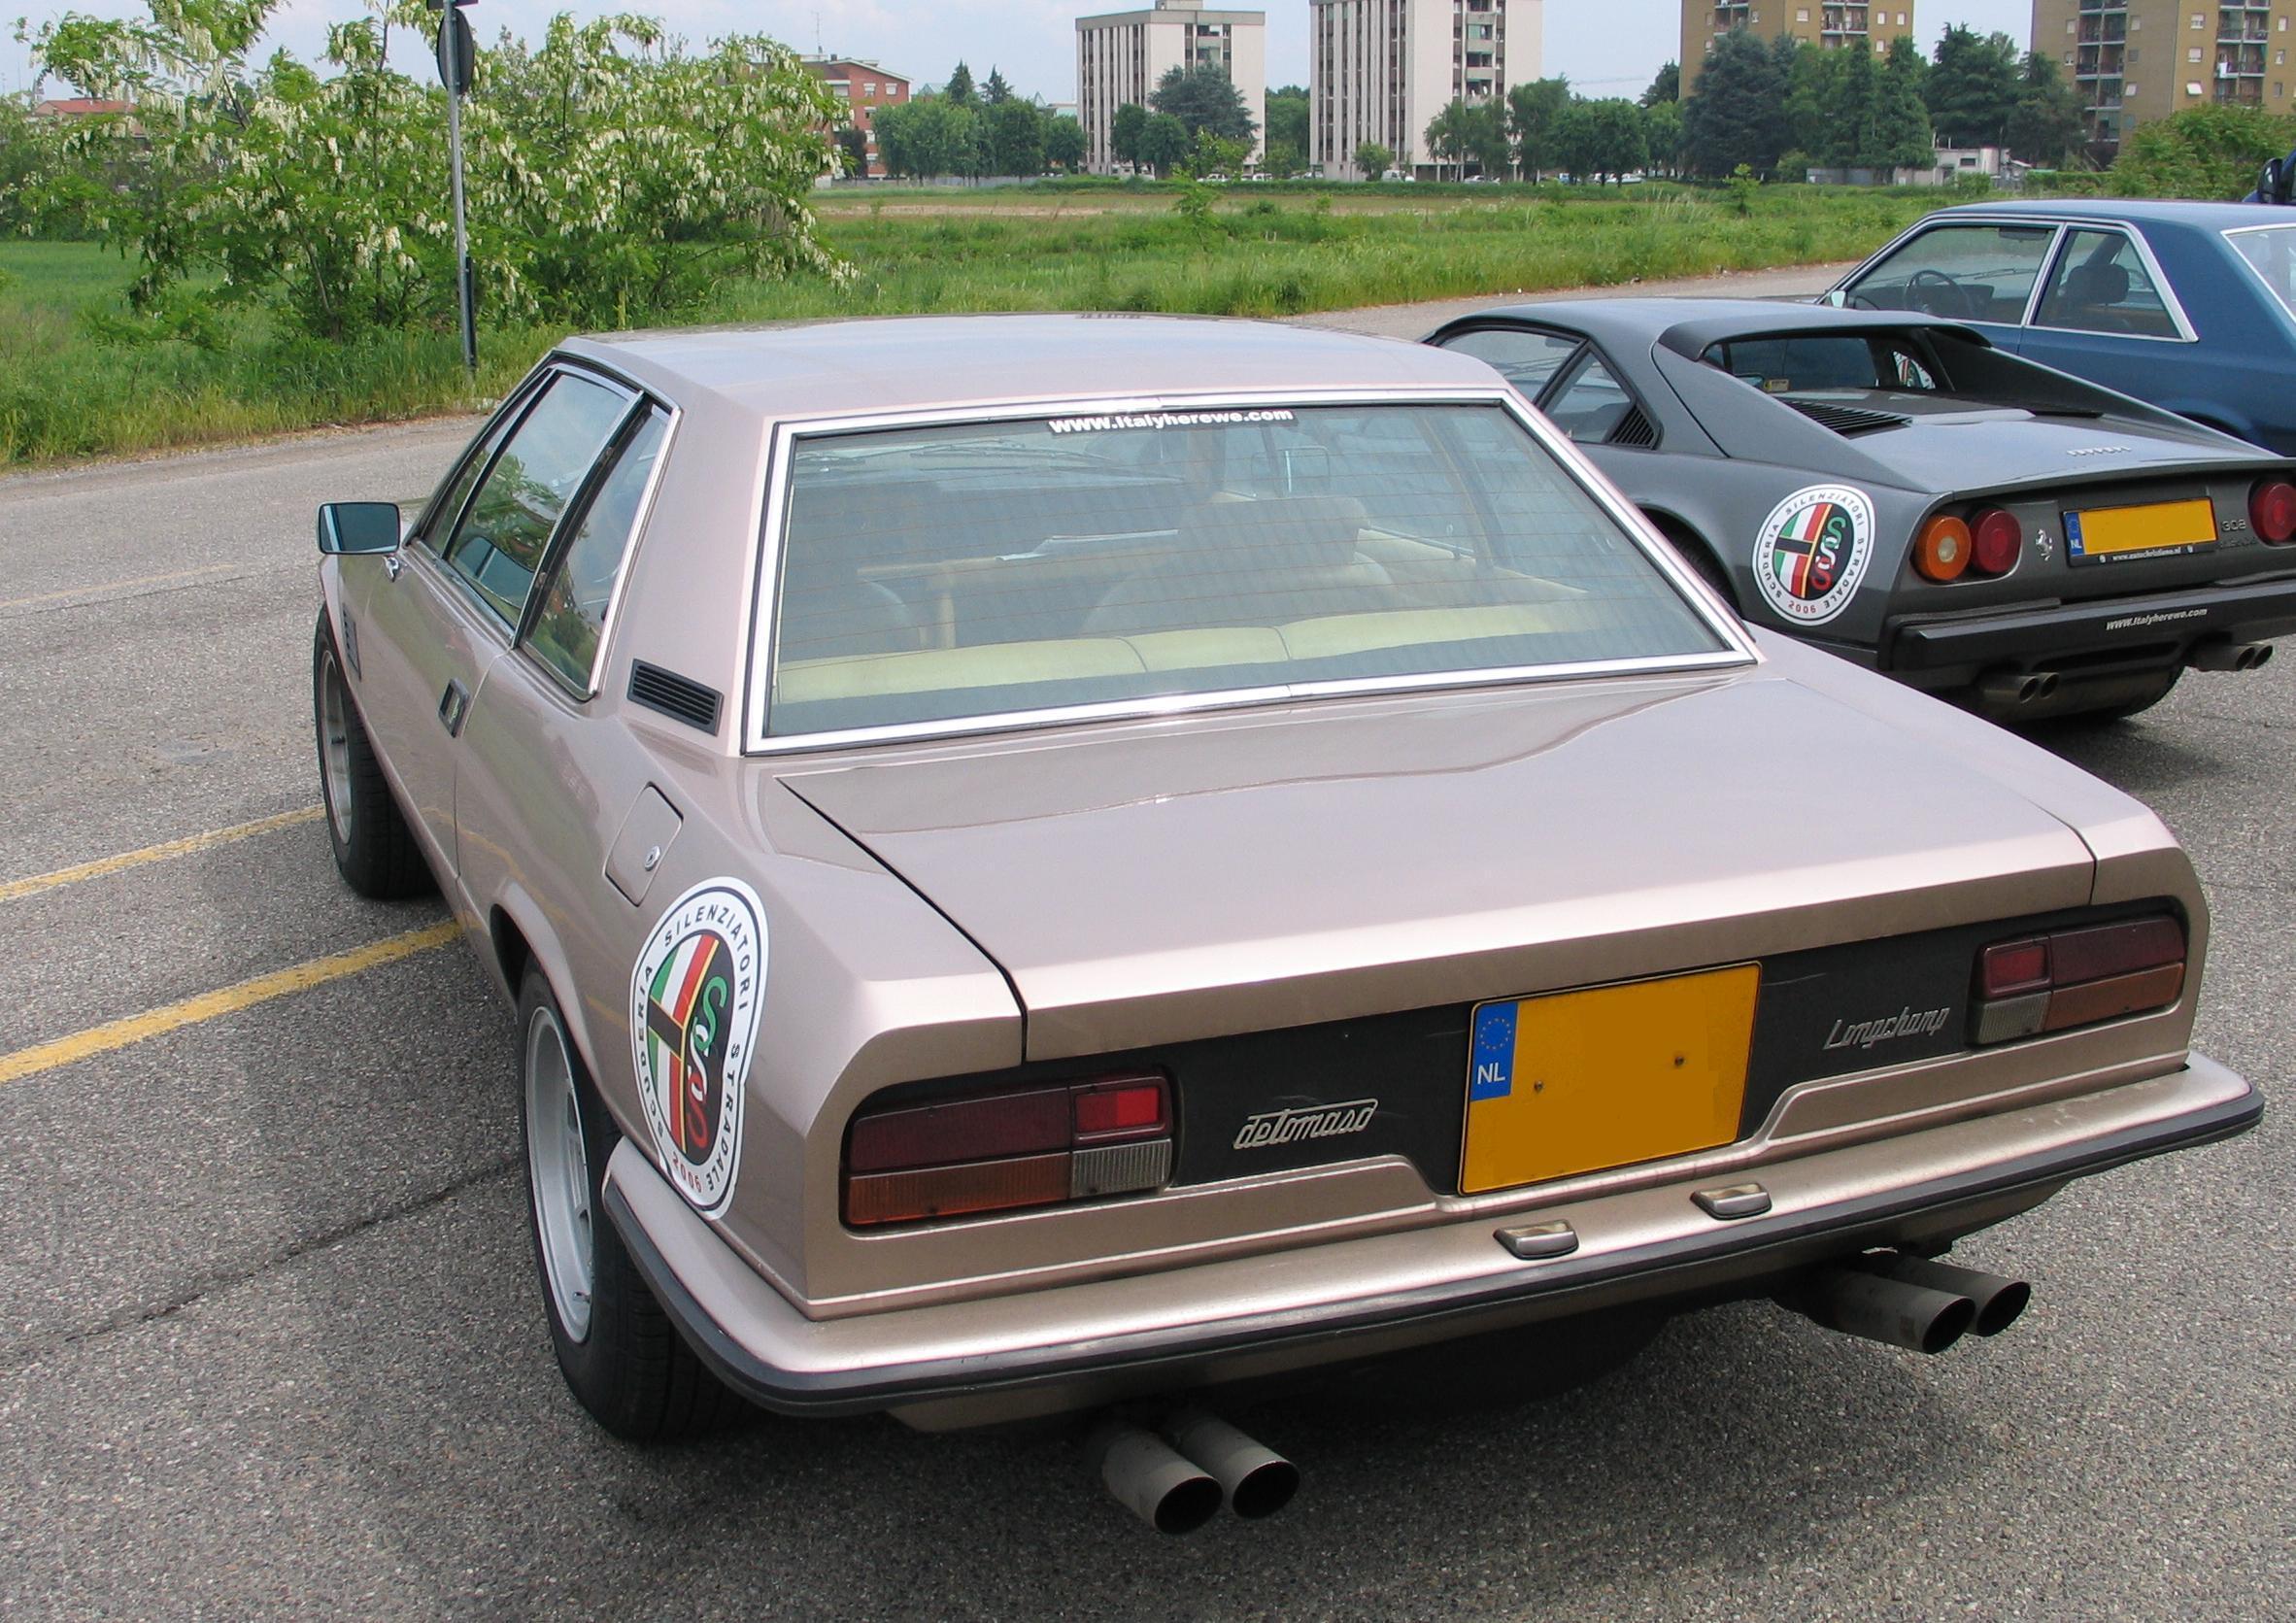 http://upload.wikimedia.org/wikipedia/commons/8/8a/DeTomaso_Longchamp_rear.jpg